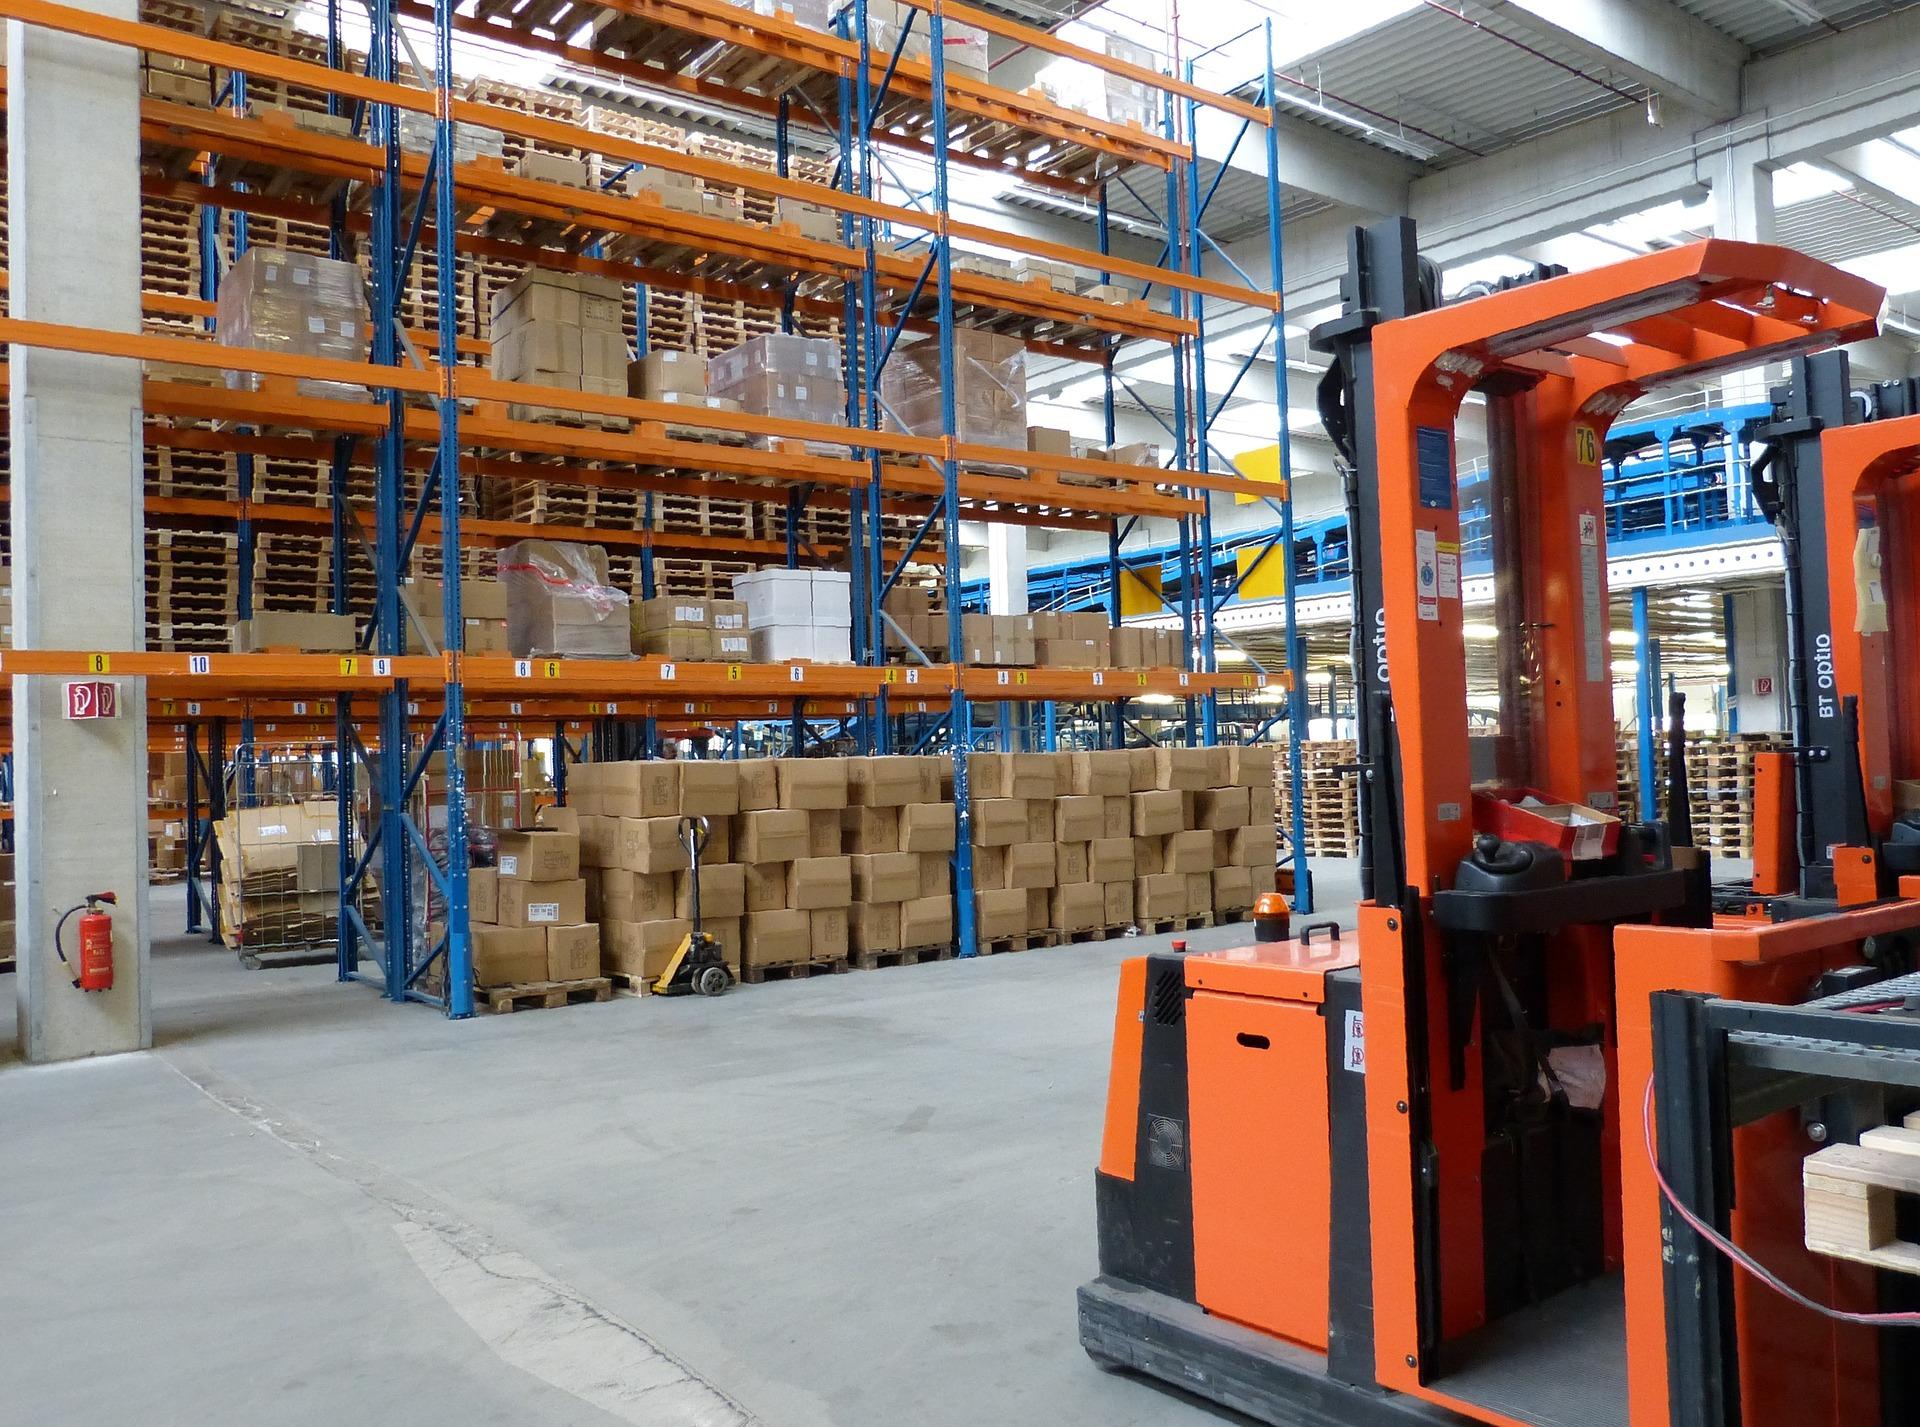 factory-1137992_1920.jpg